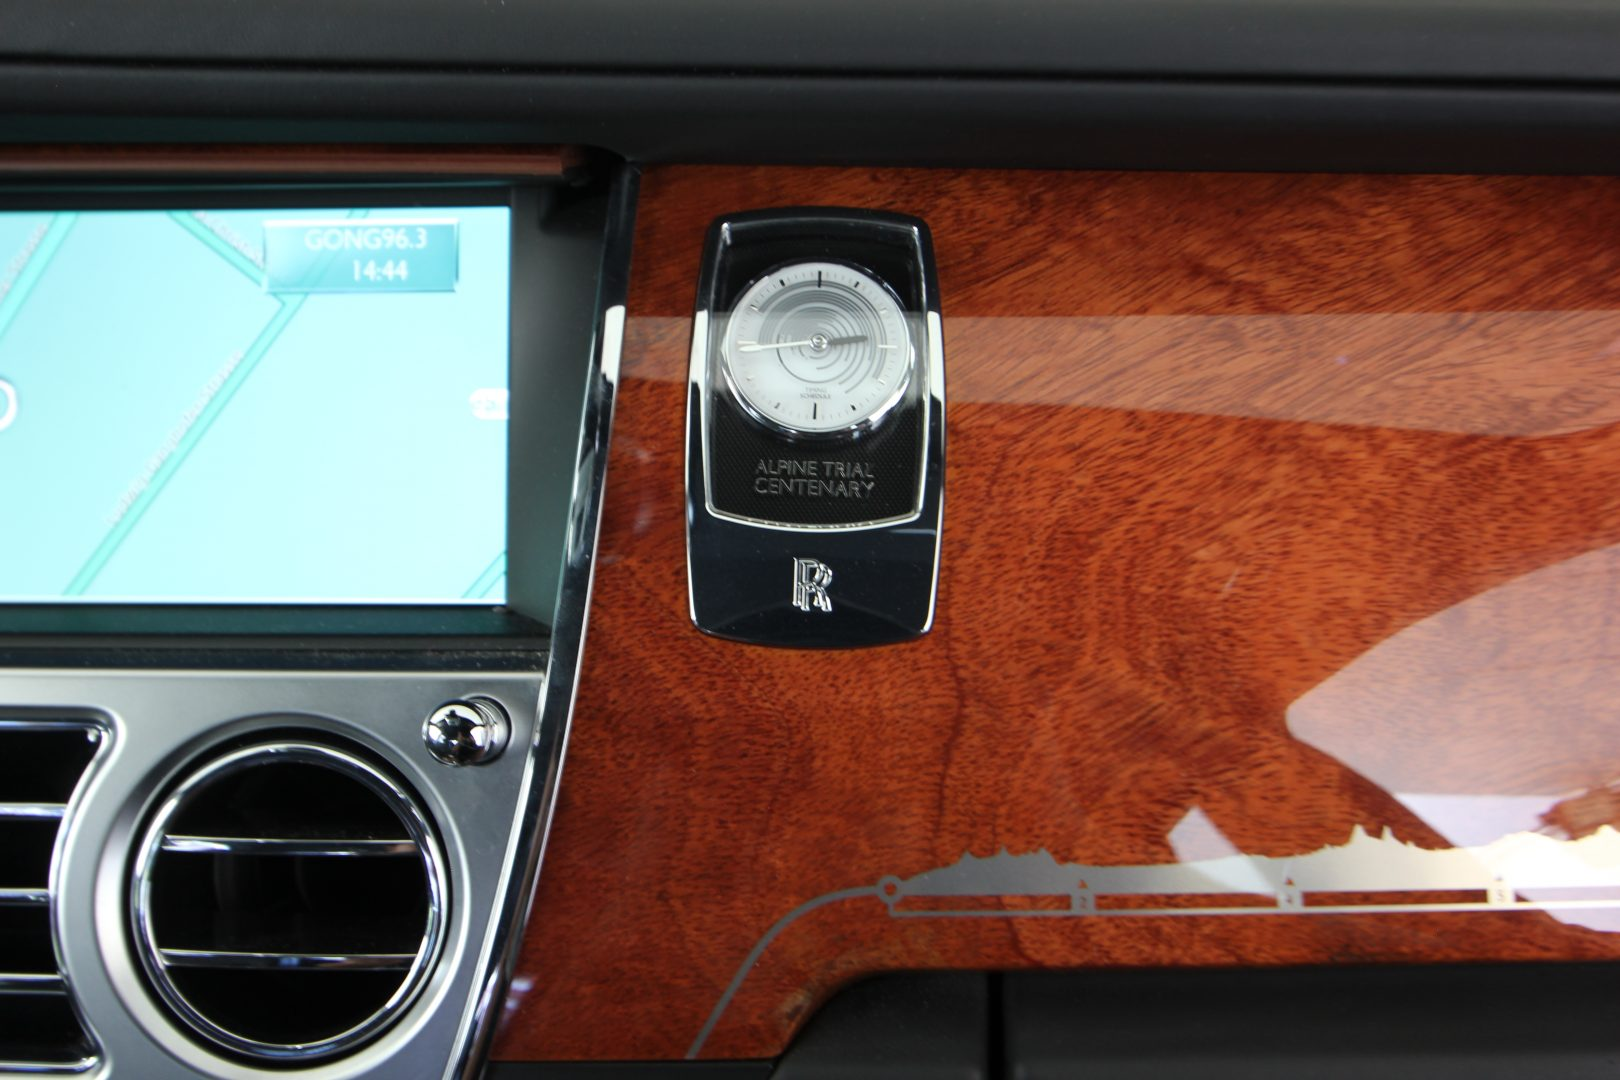 AIL Rolls Royce Ghost Alpine Trial 2